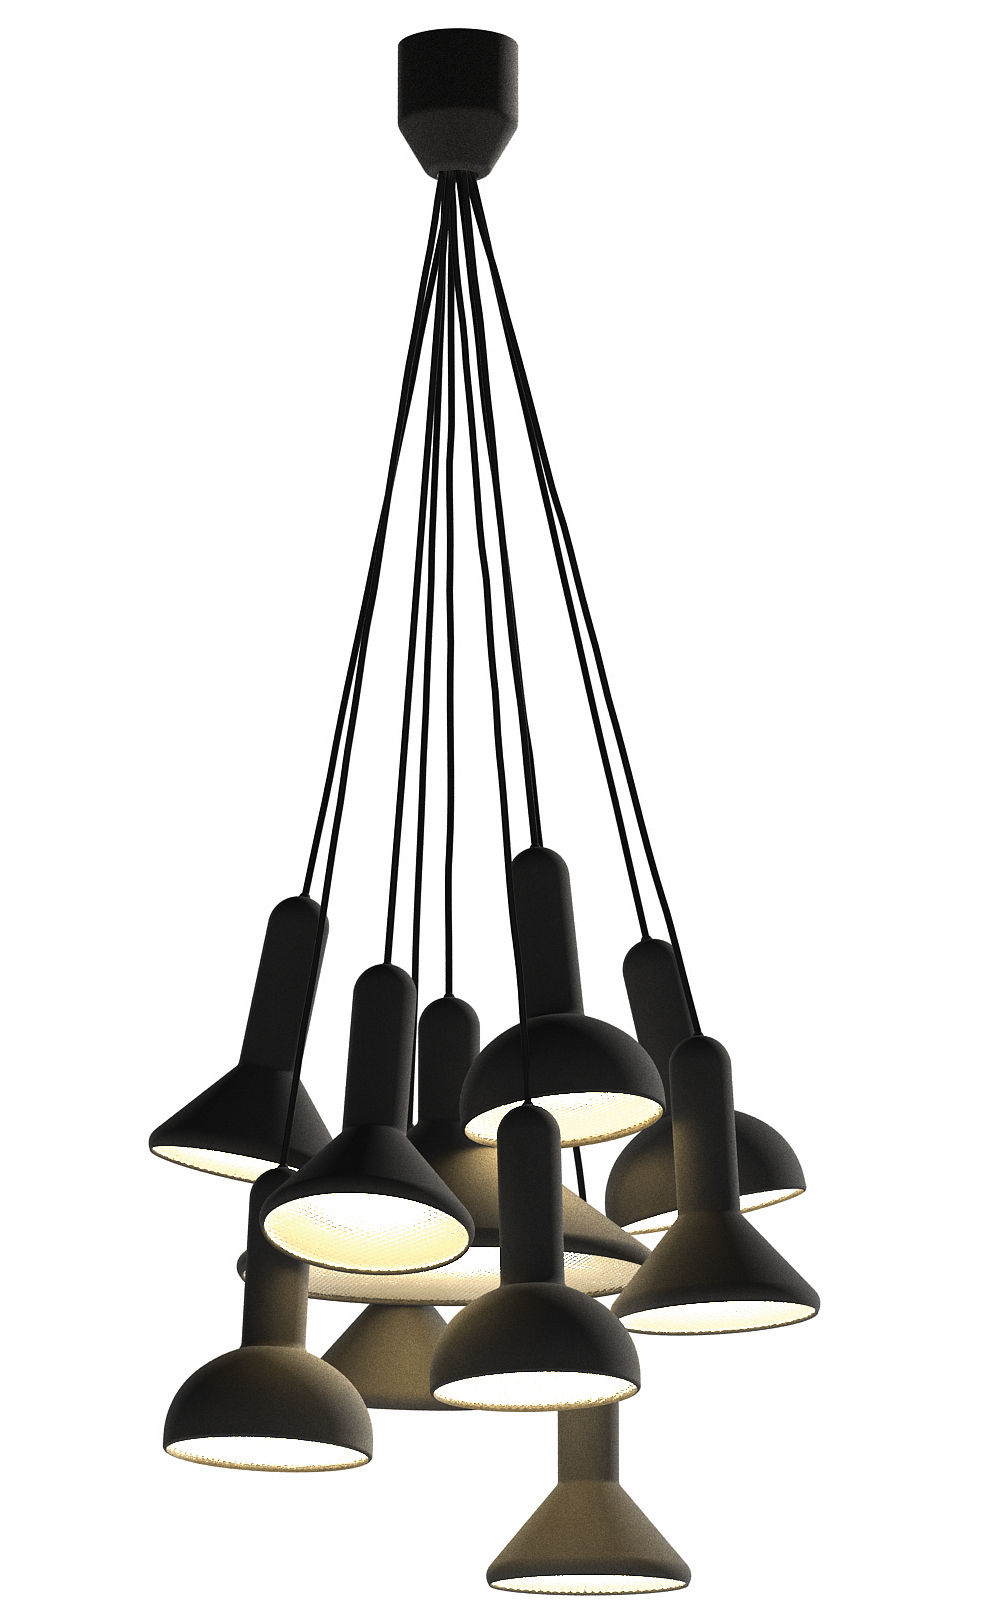 Lighting - Pendant Lighting - Torch Light Pendant - Set of 10 pendants by Established & Sons - Black - Black cable - PVC